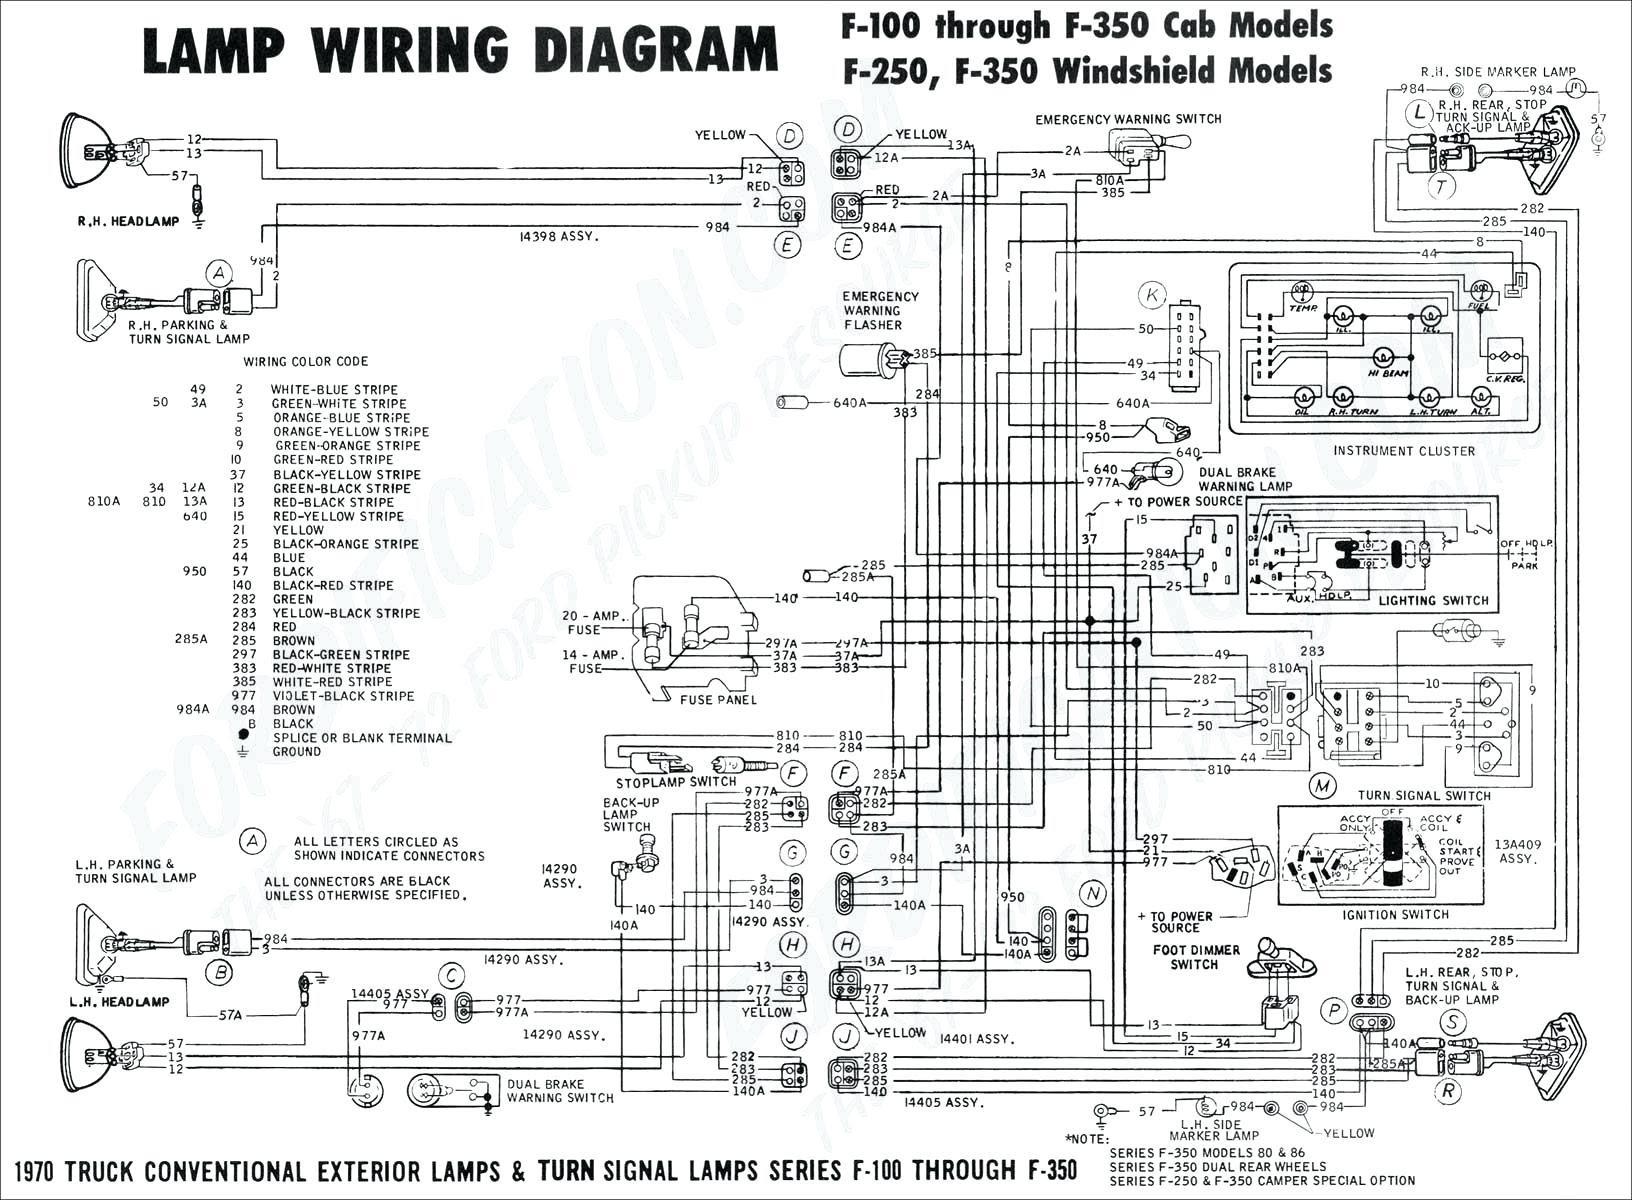 Manuals 2005 Ford Escape Fuse Panel Diagram Pdf Full Version Hd Quality Panel Diagram Pdf Bestmanualguide Securpolgroup It